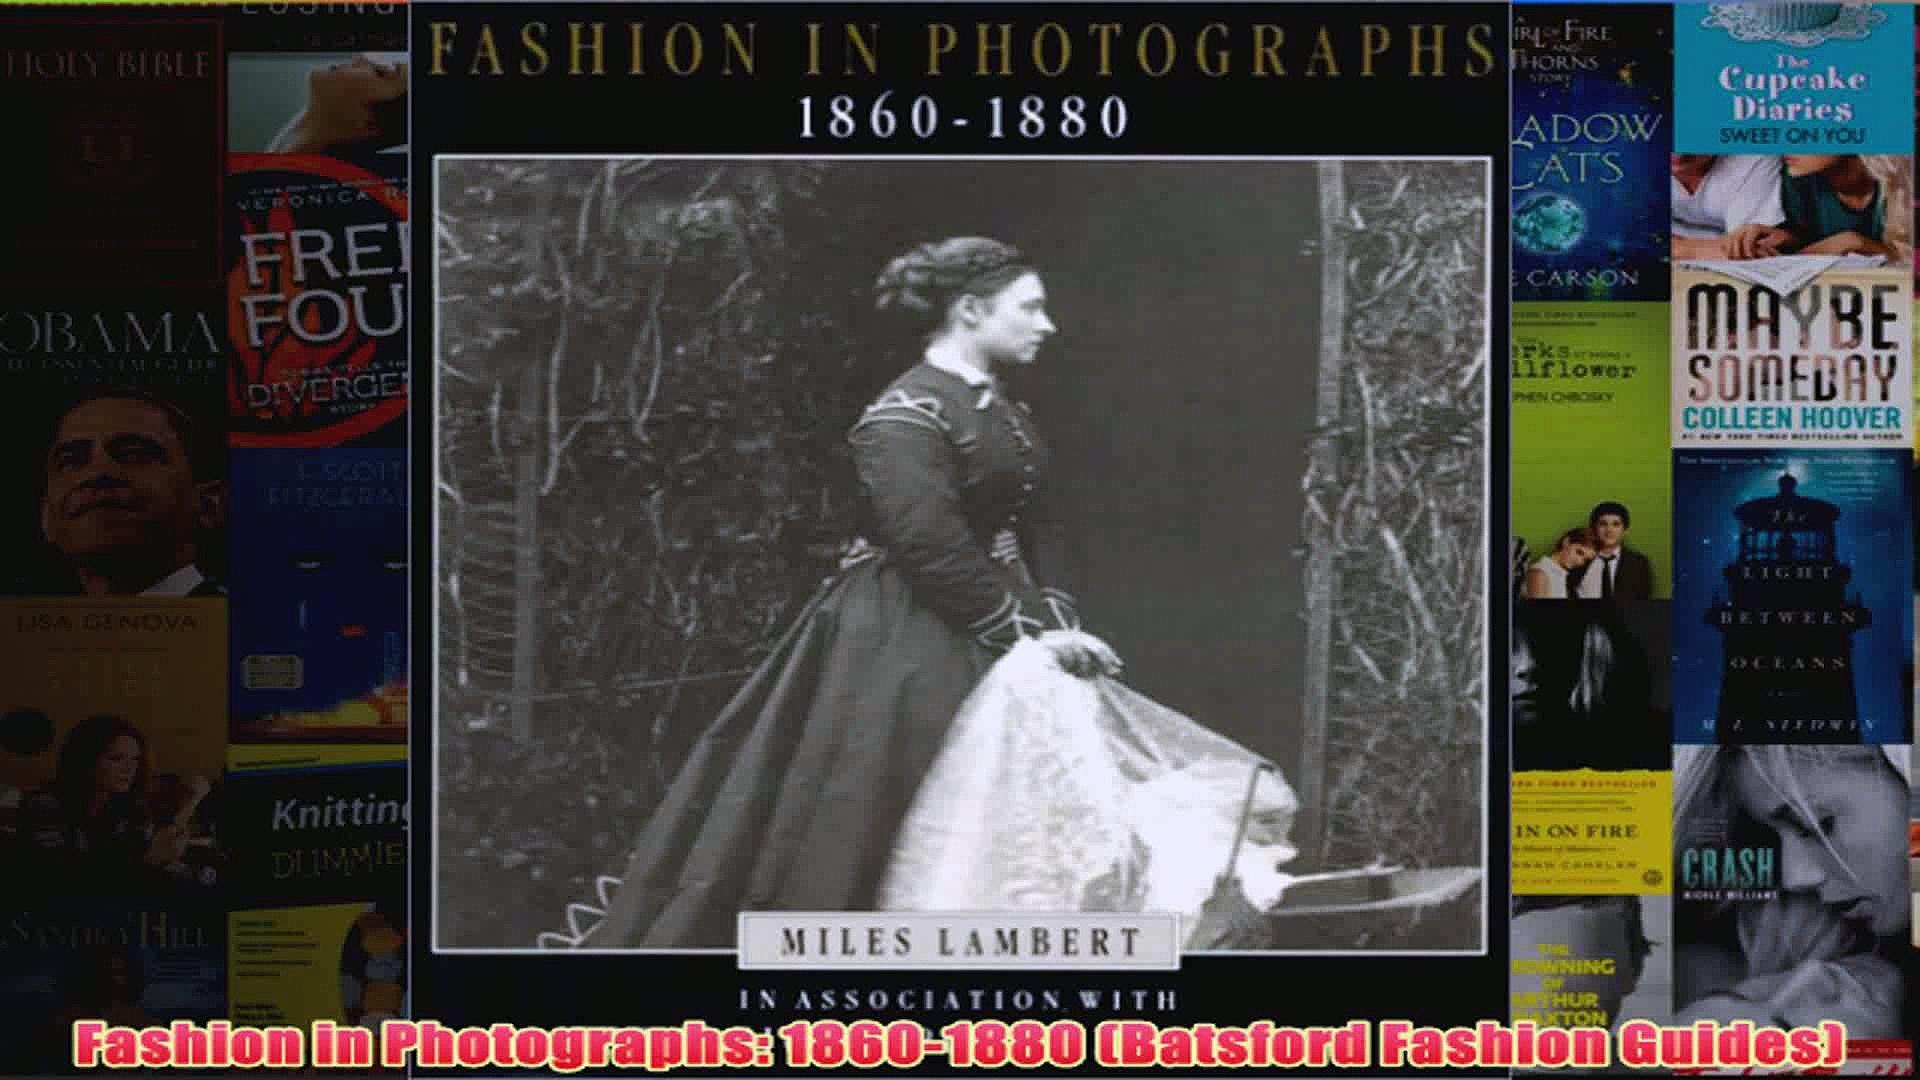 Fashion in Photographs 18601880 Batsford Fashion Guides